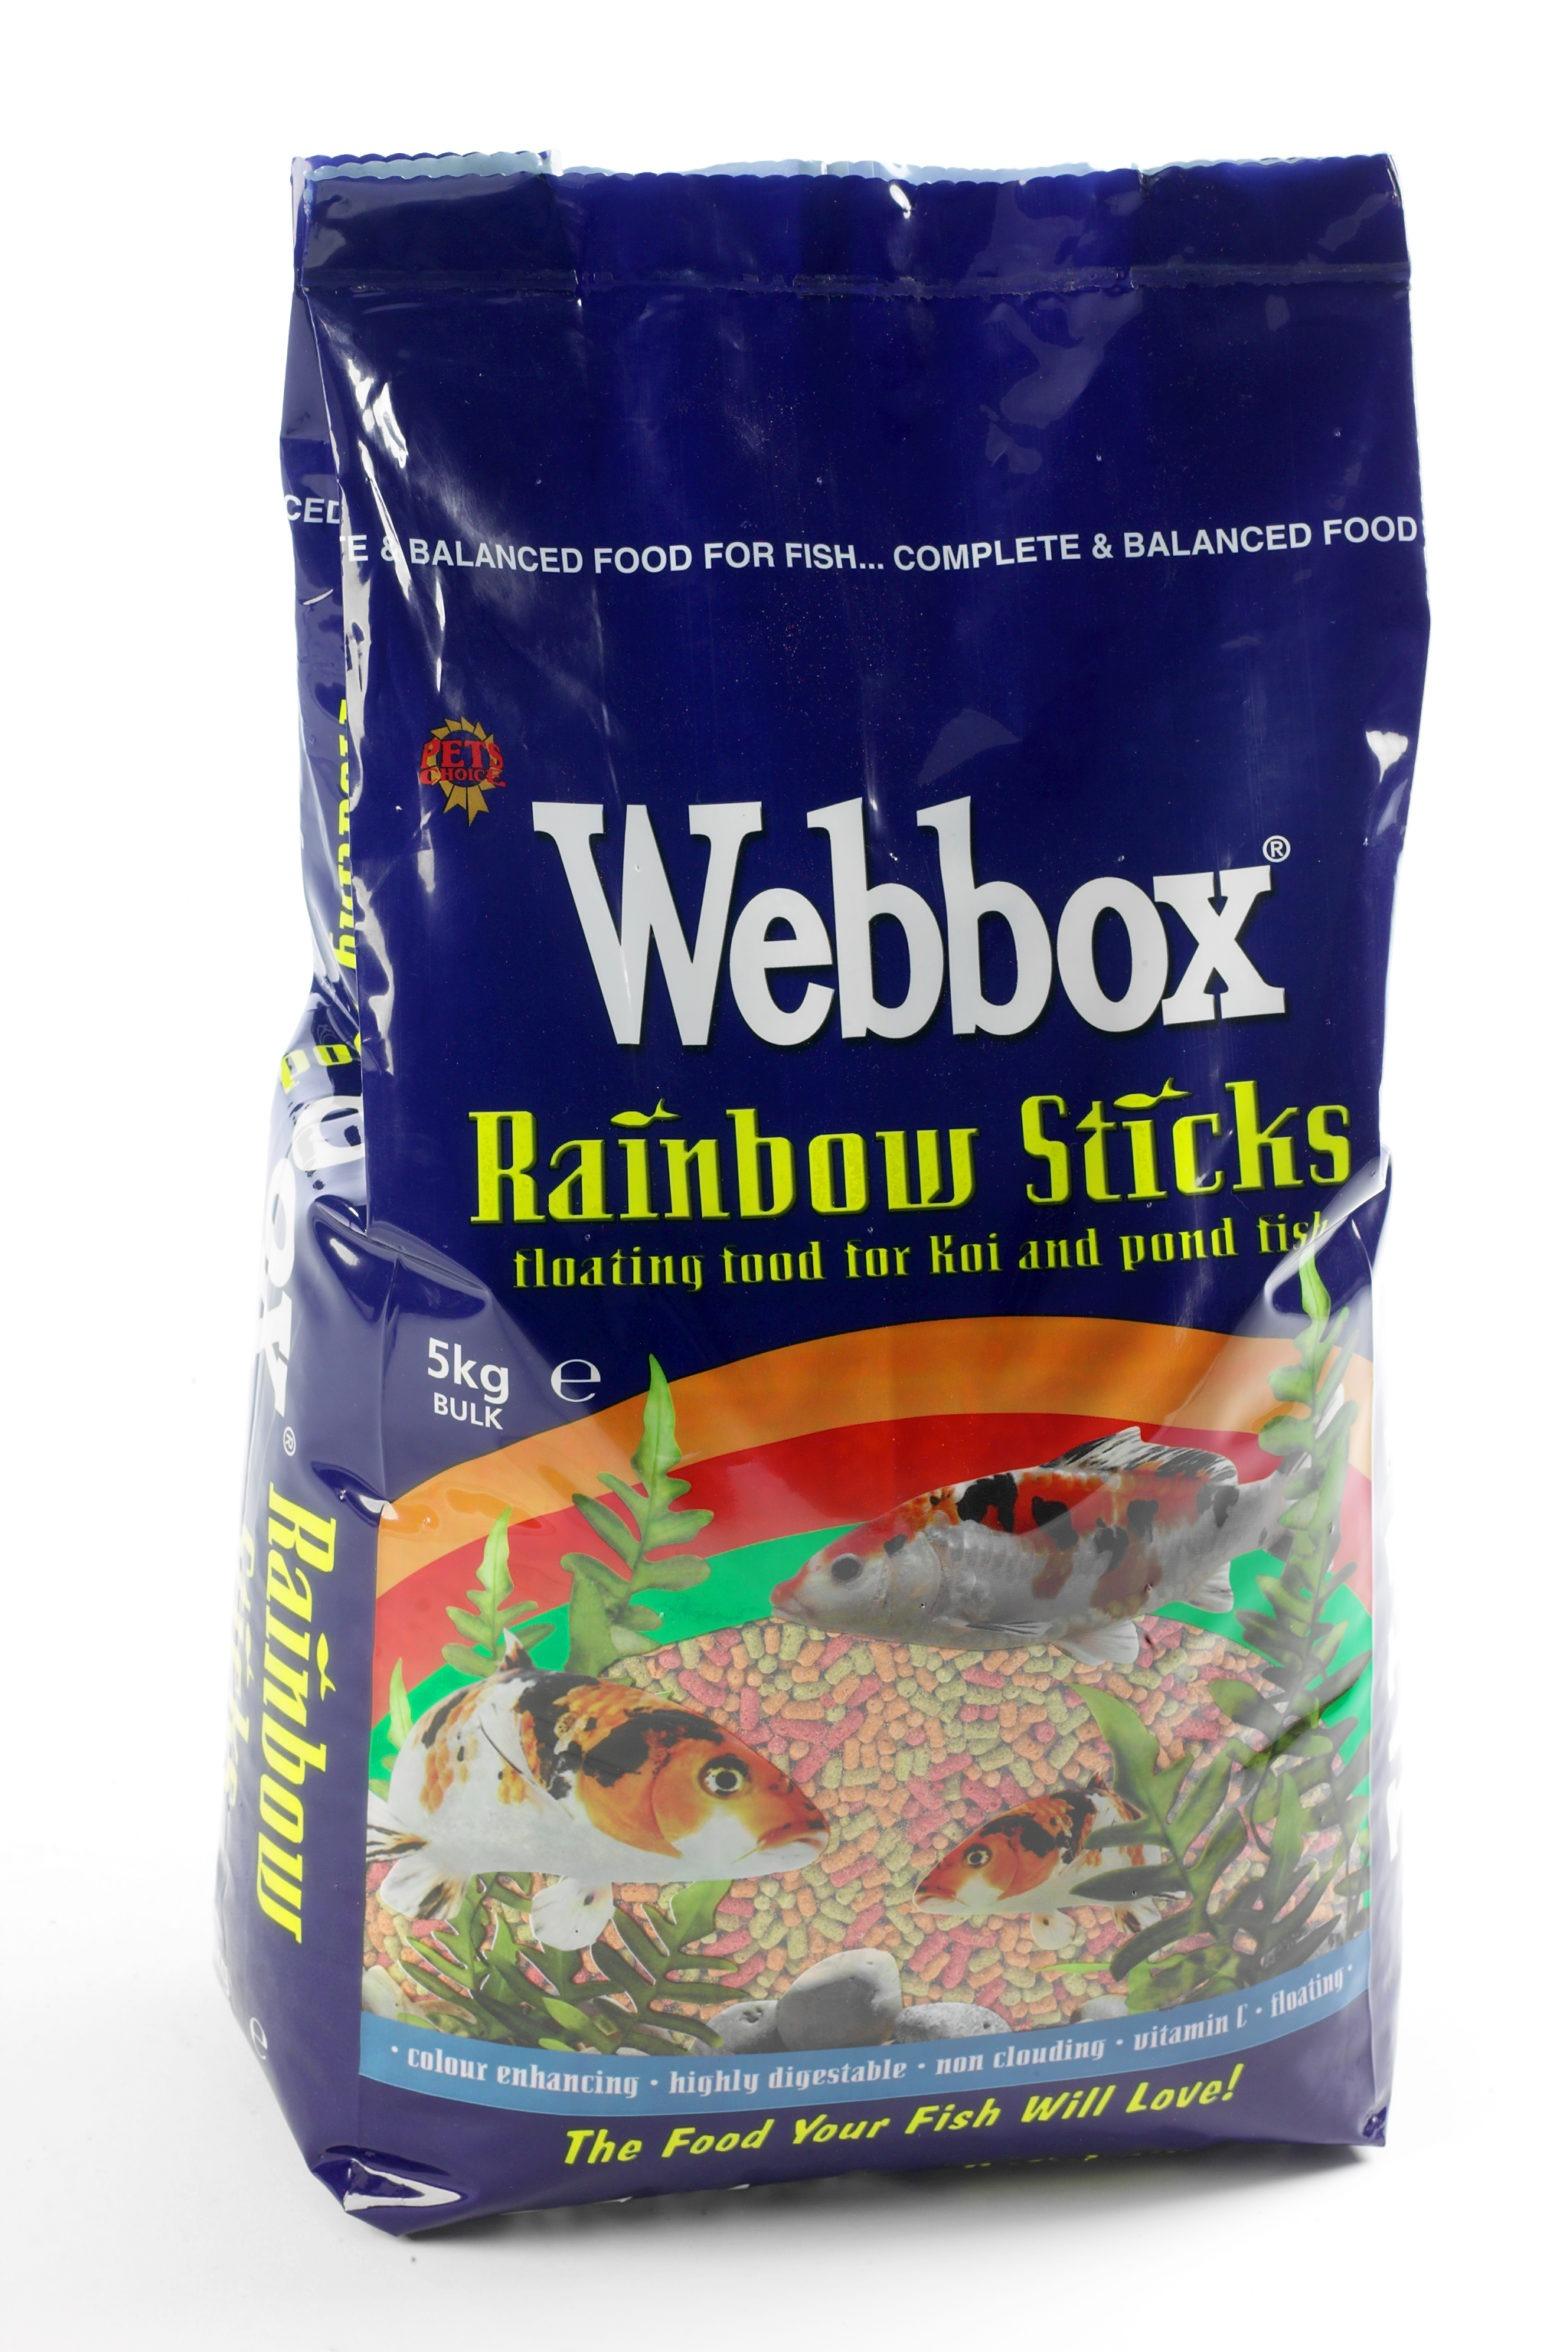 Webbox Rainbow Sticks Fish Food